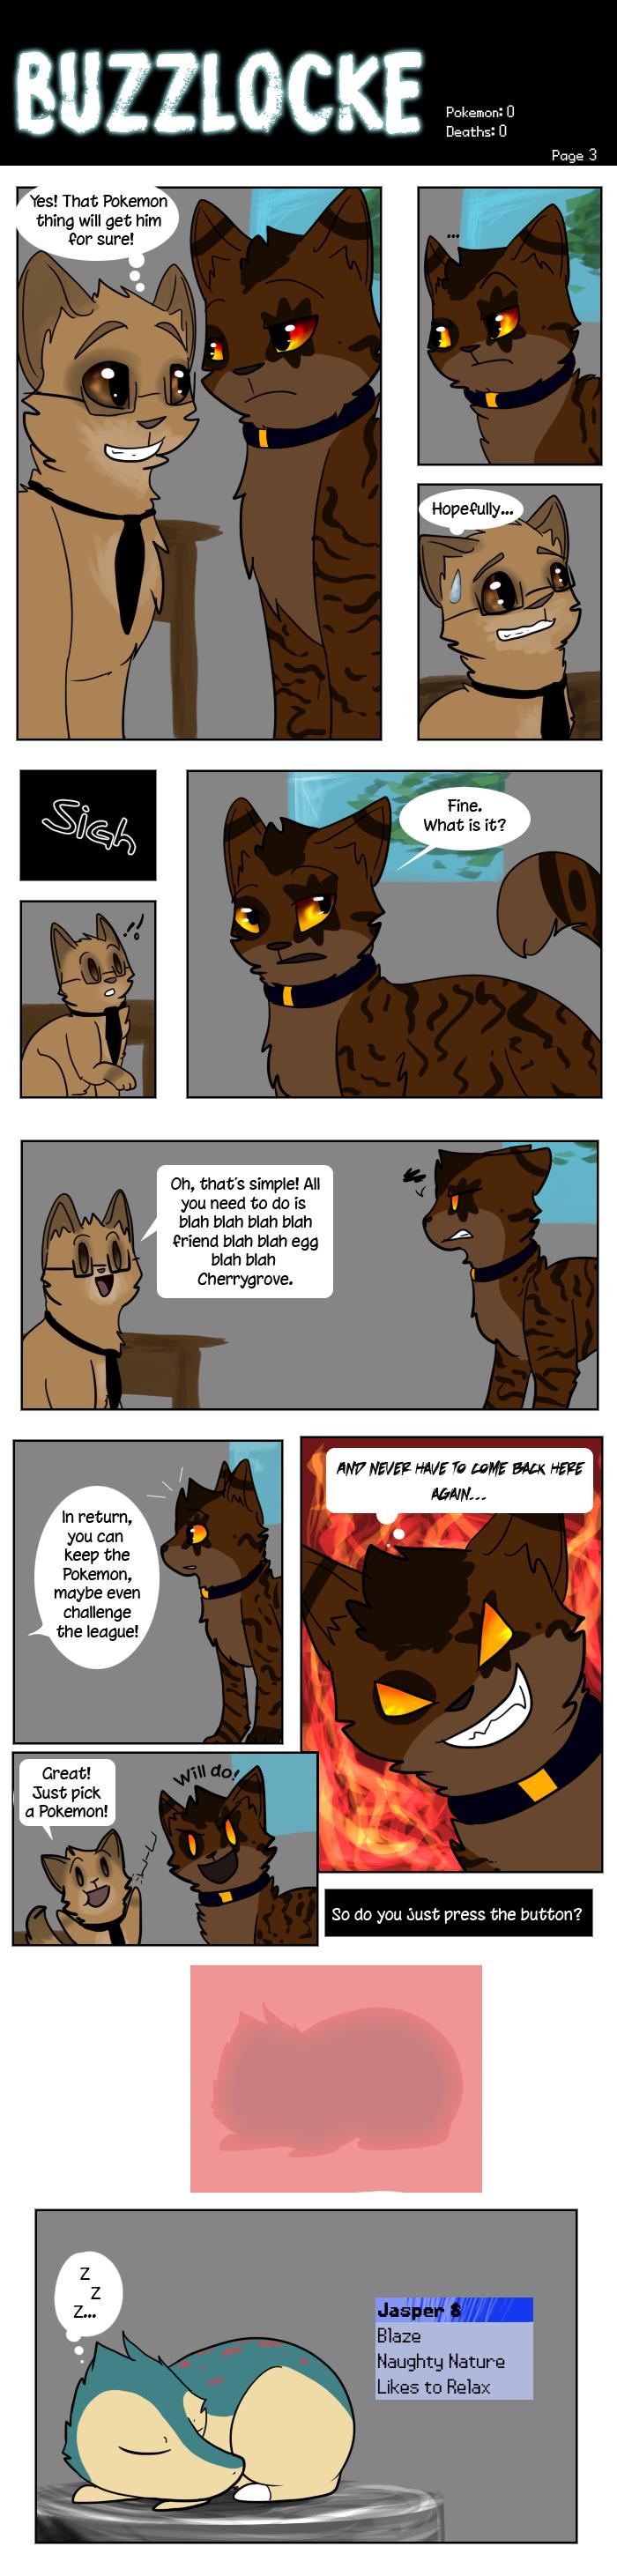 Buzzlocke Page 3 by Spiritpie